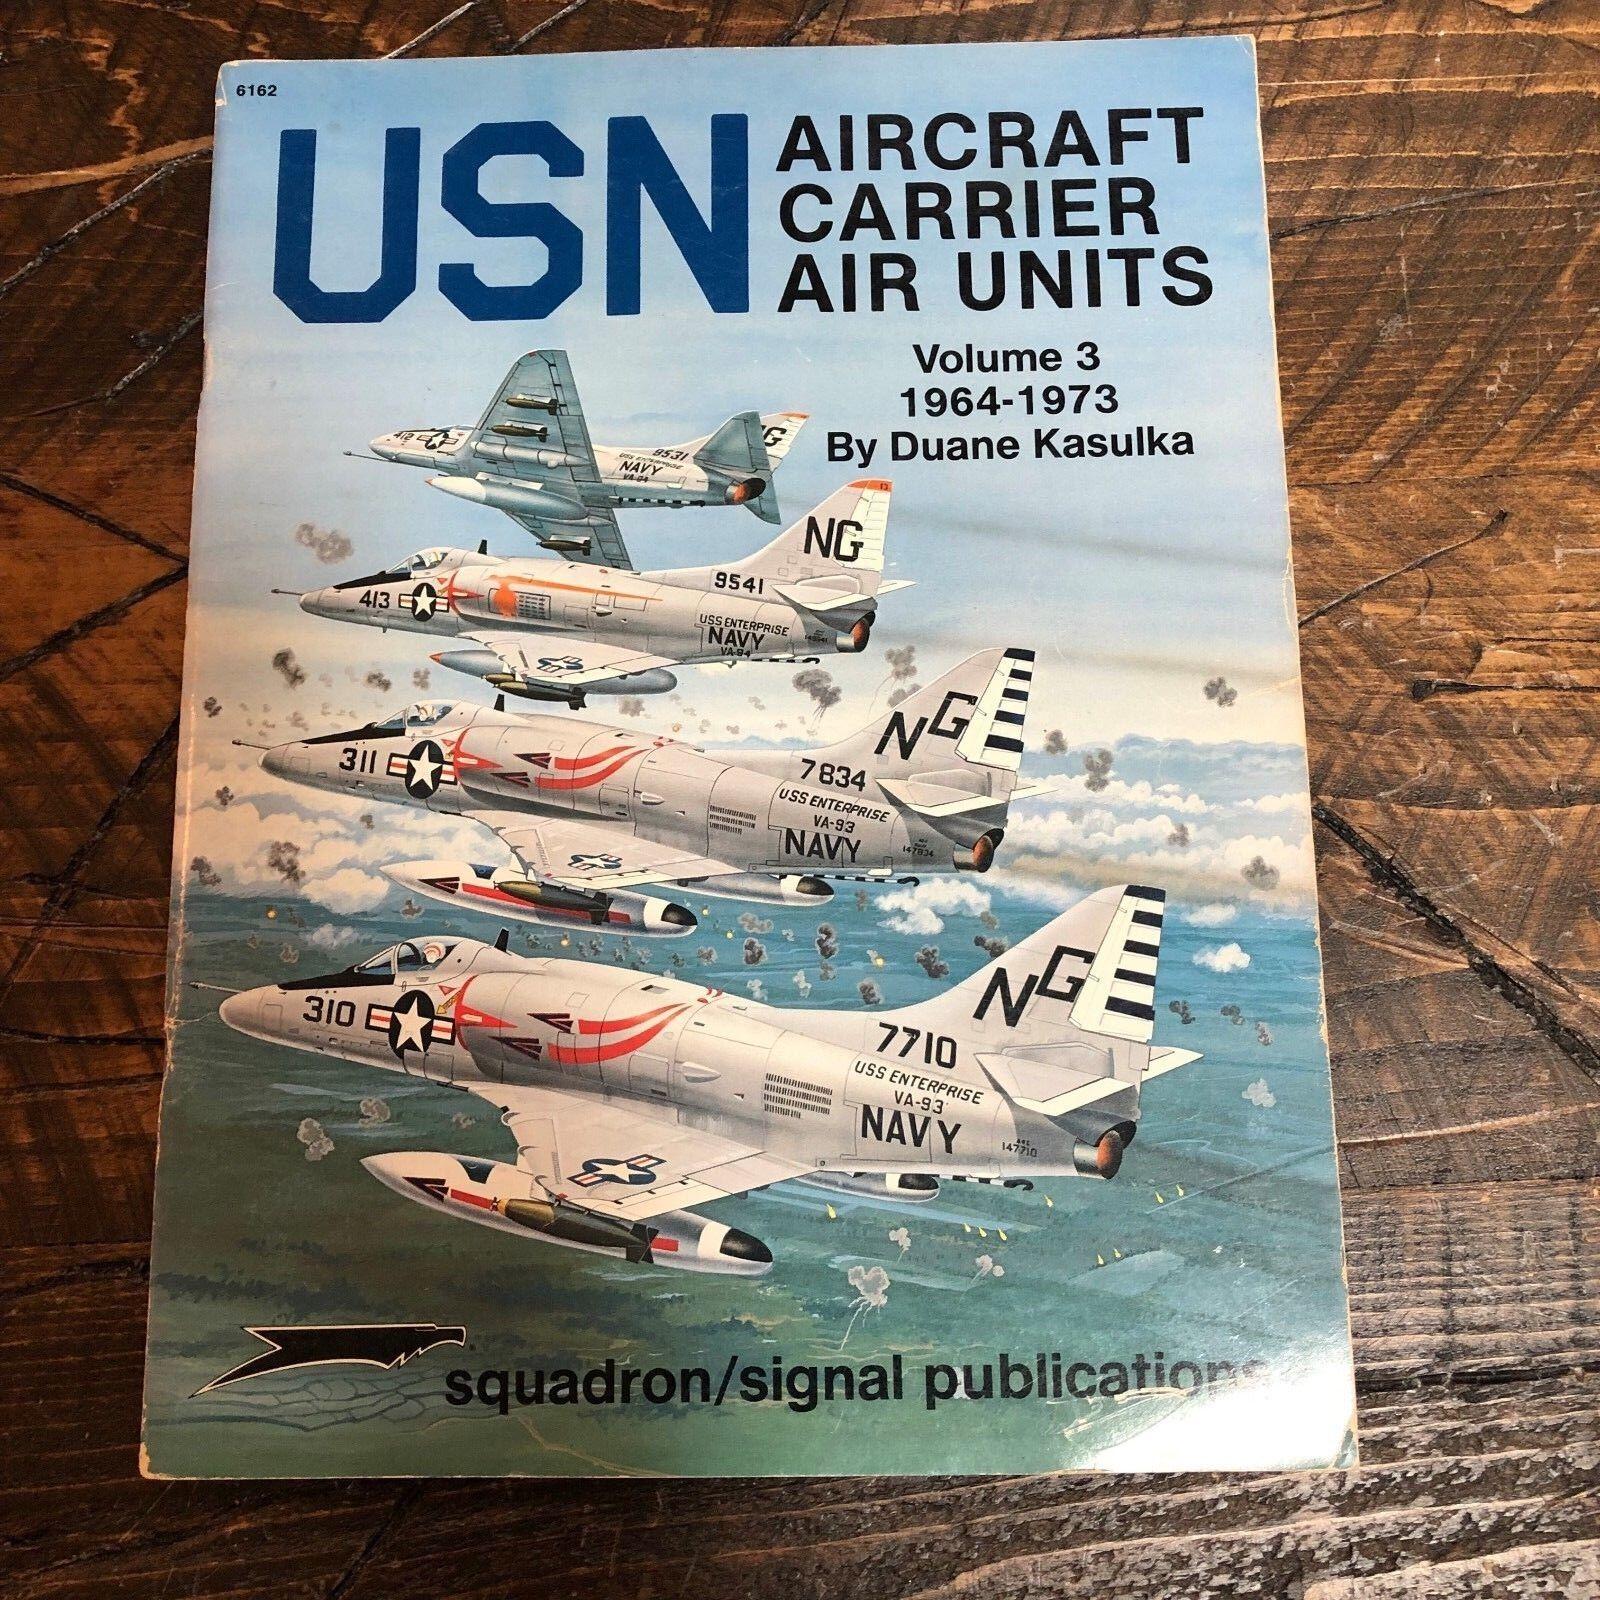 USN Aircraft Carrier Air Units vol.3 - 1964-1973